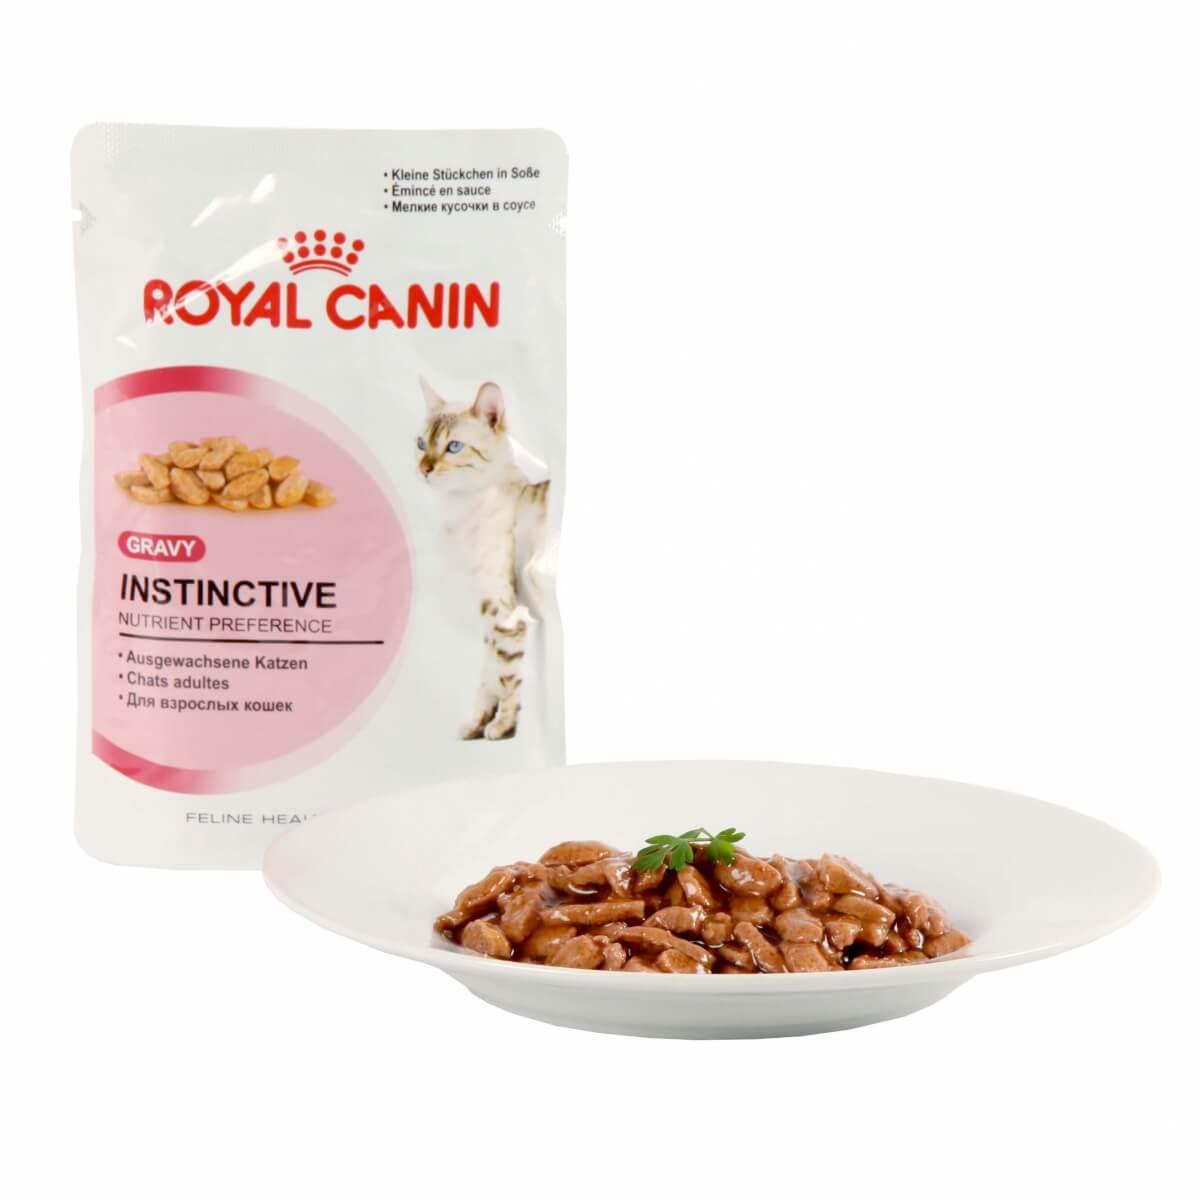 royal canin katzenfutter instinctive in so e 12 frischebeutel nassfutter f r katzen. Black Bedroom Furniture Sets. Home Design Ideas